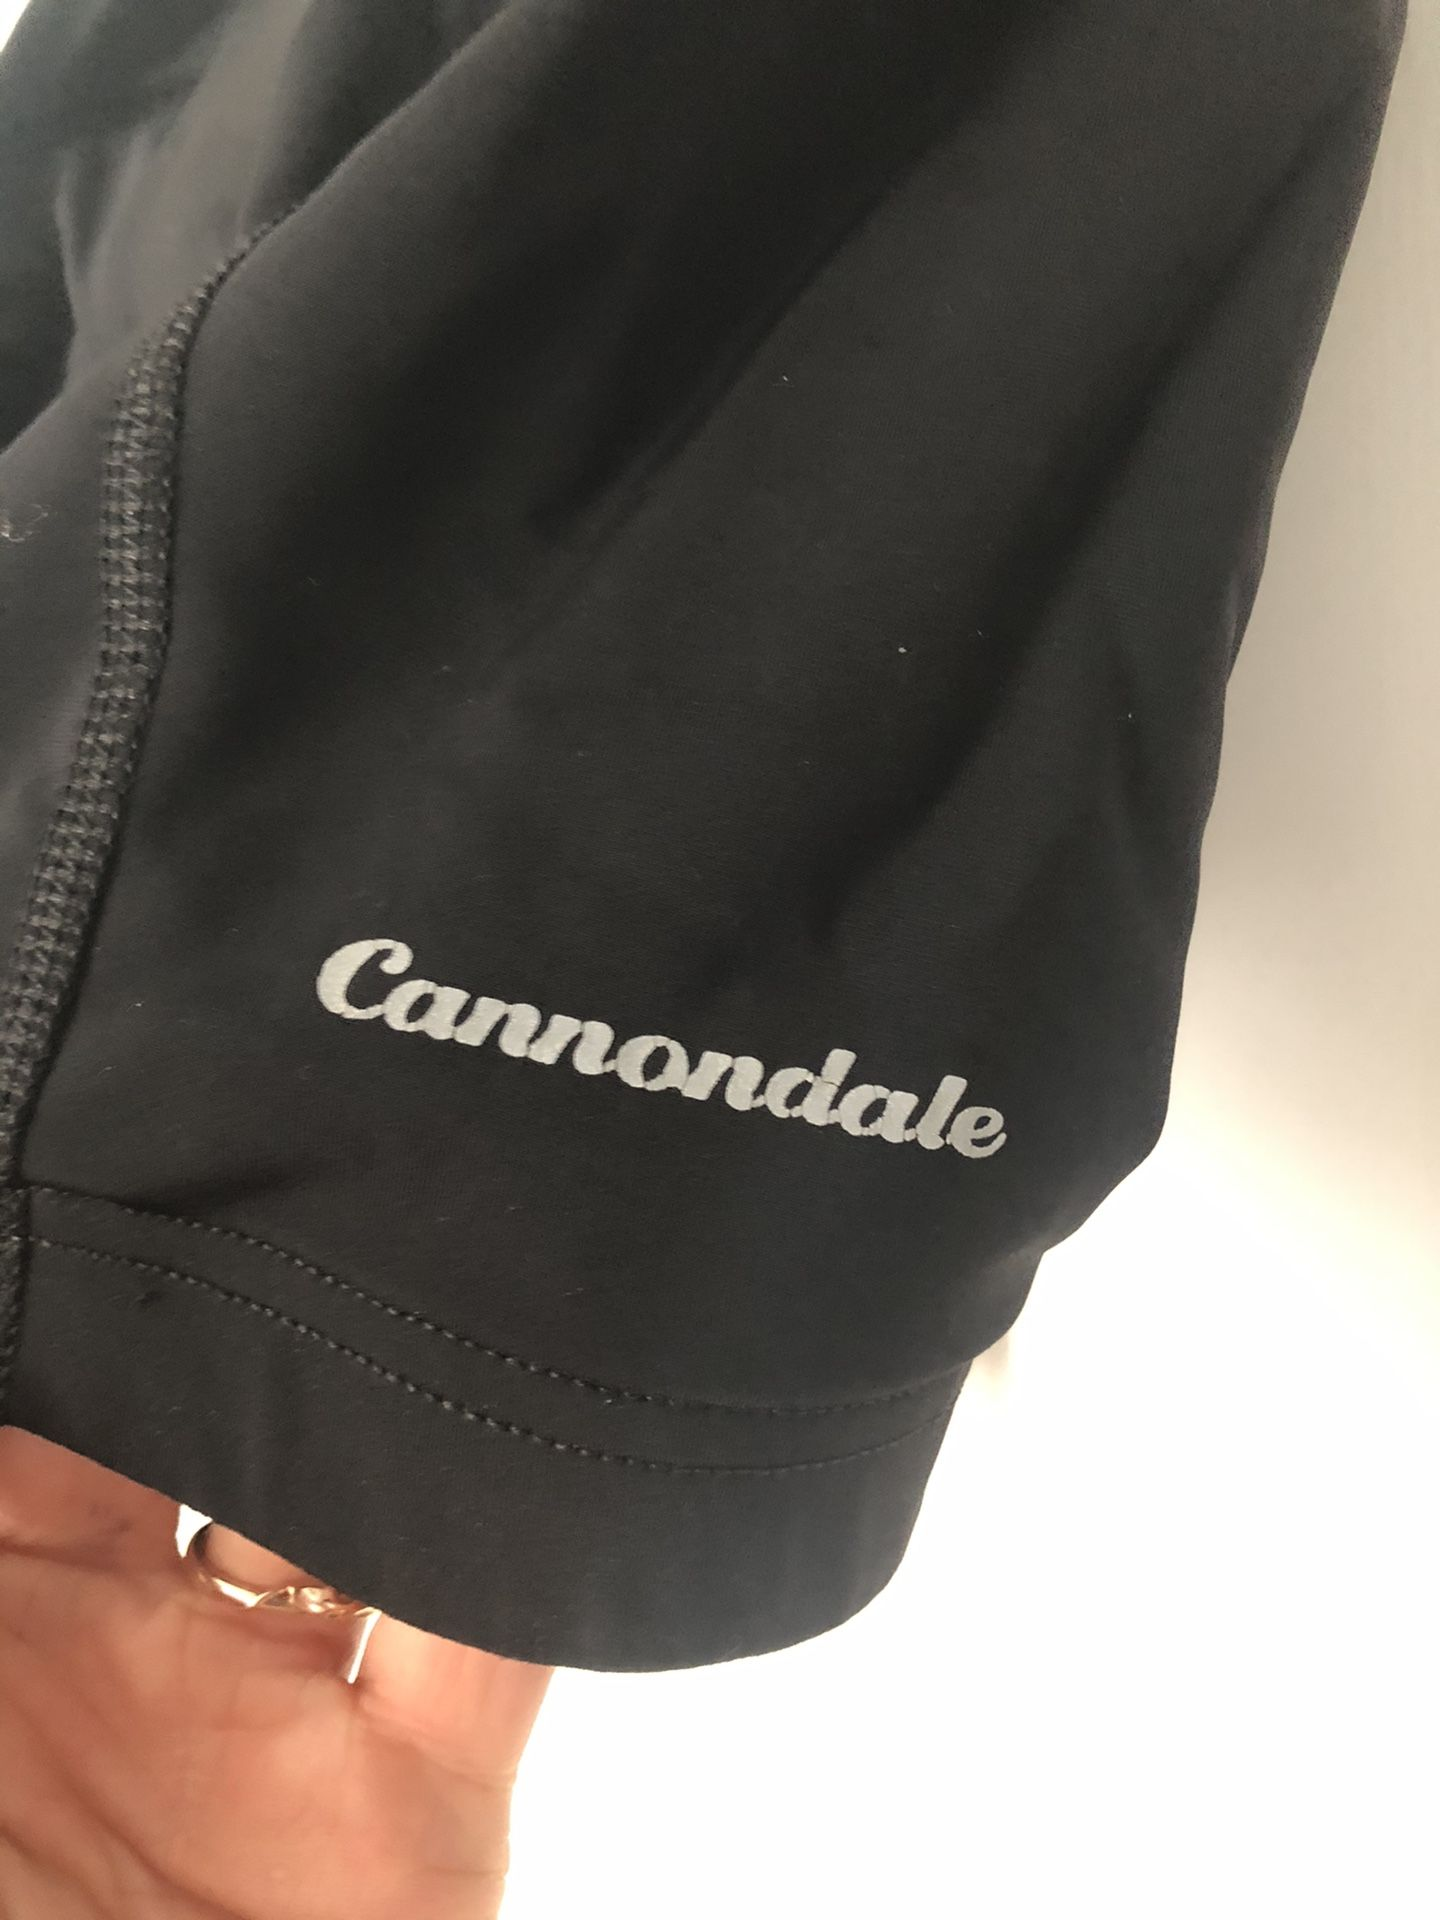 Great Cannondale Bike Shorts!